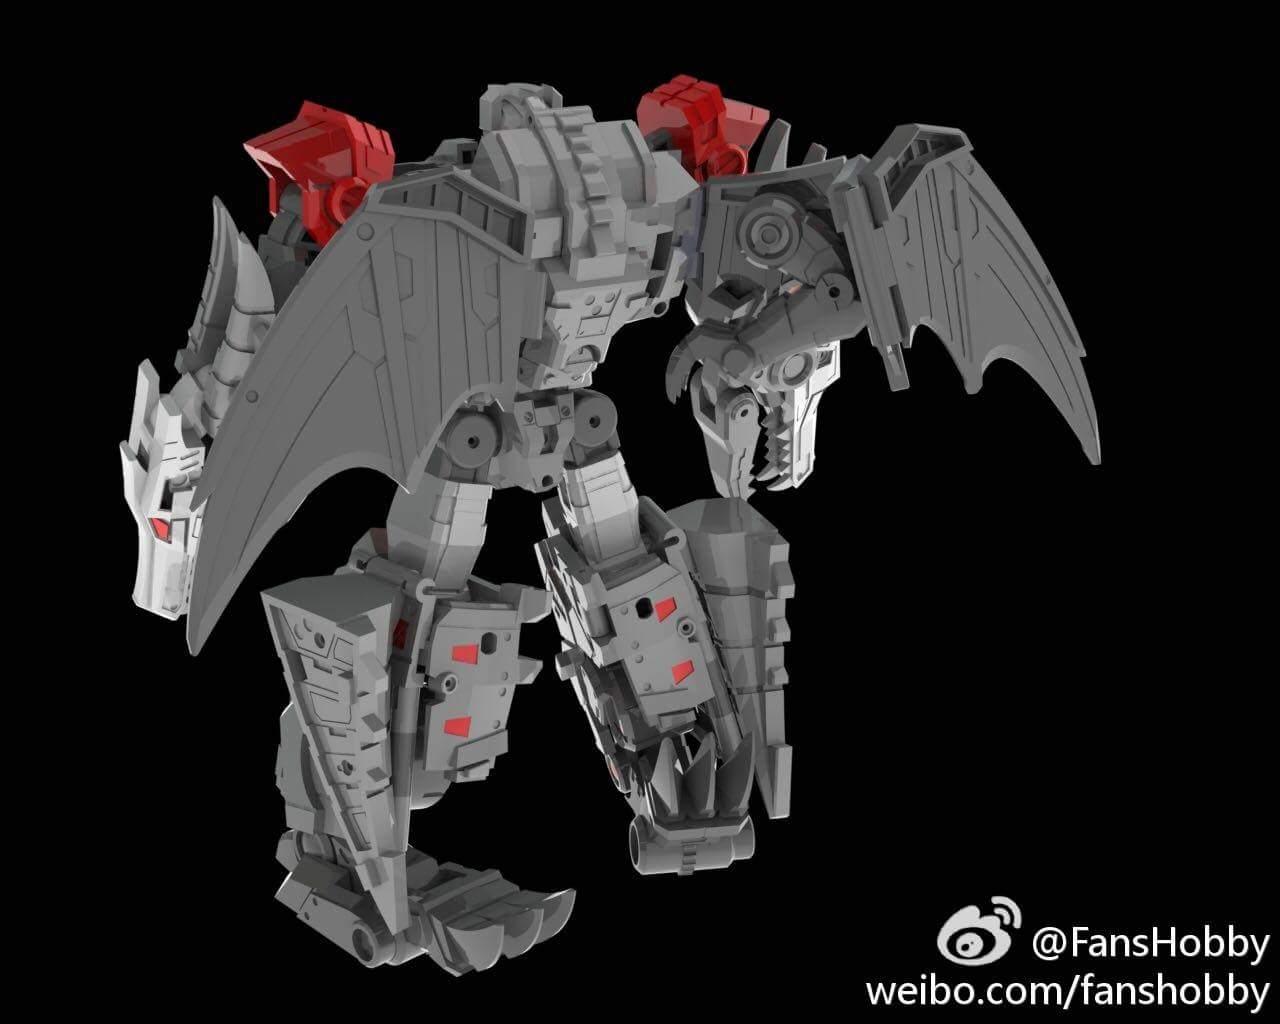 [FansHobby] Produit Tiers - Master Builder MB-02/03/05 - aka Monsterbots/Monstrebots - Page 2 Ye61XTlT